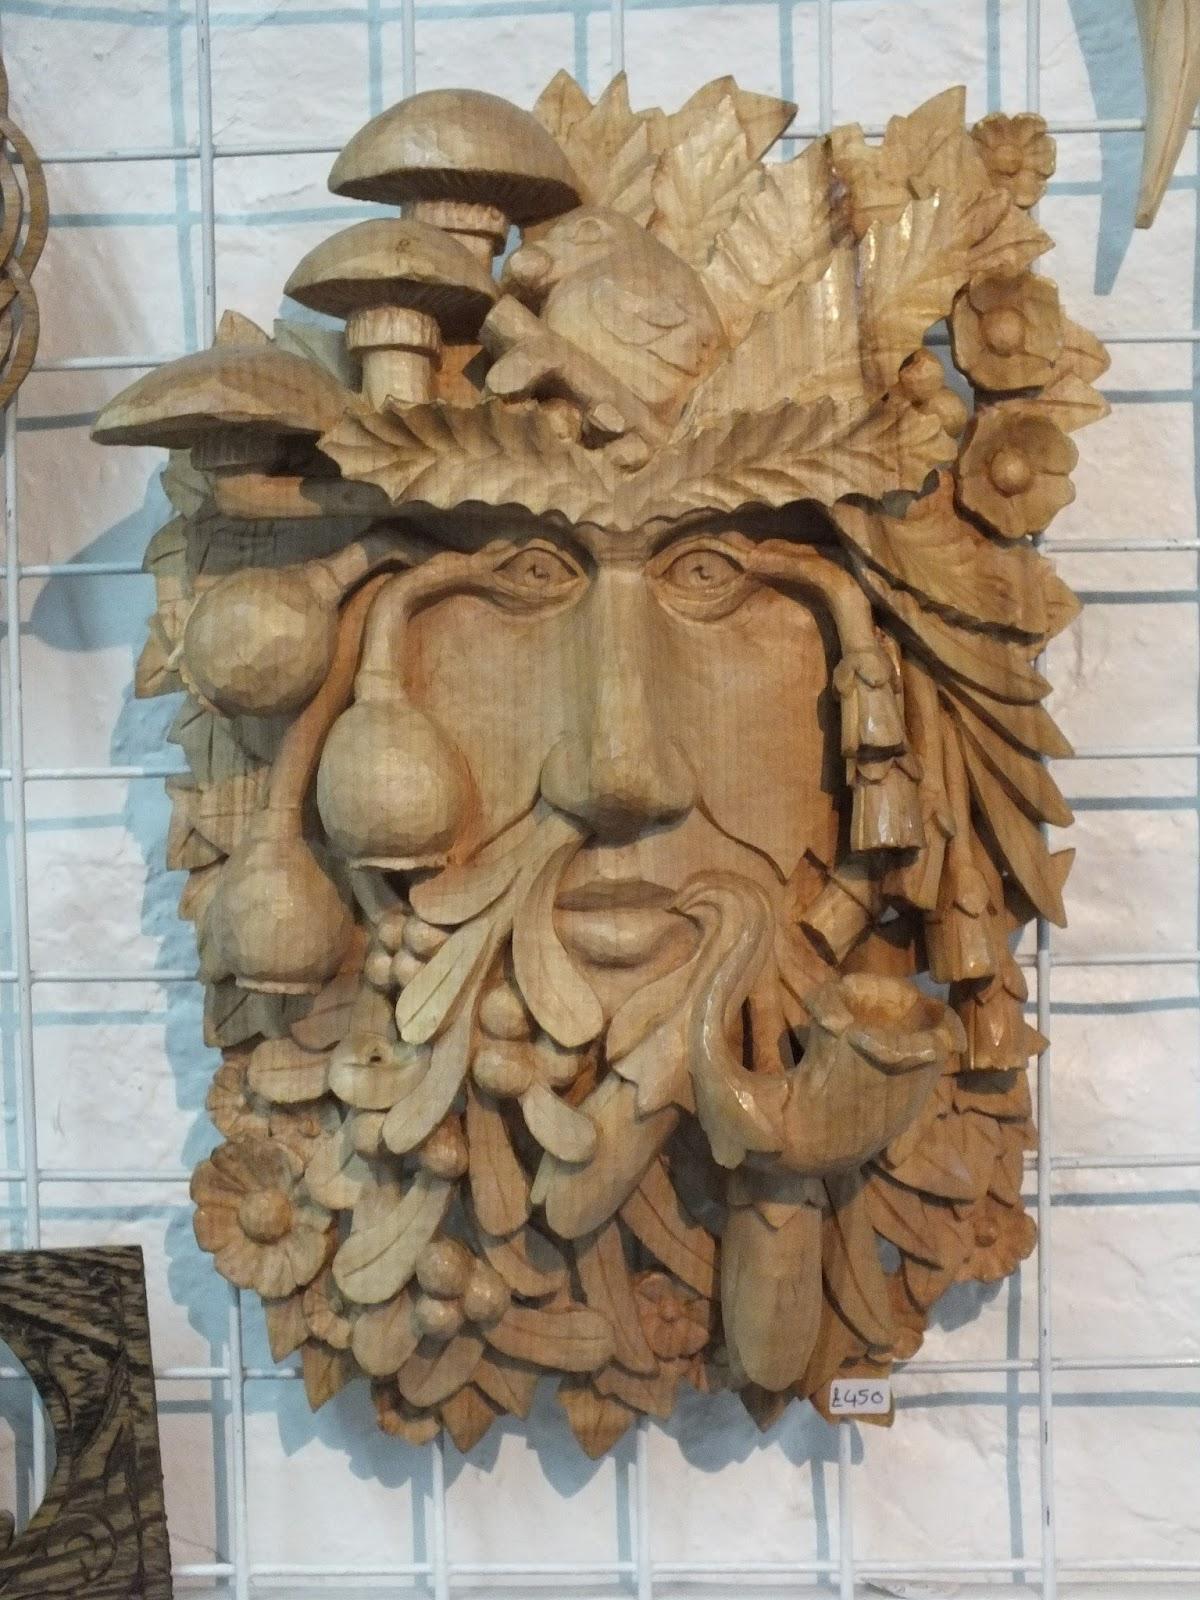 Local chainsaw carver profiled by monstrinthedark u the harlem